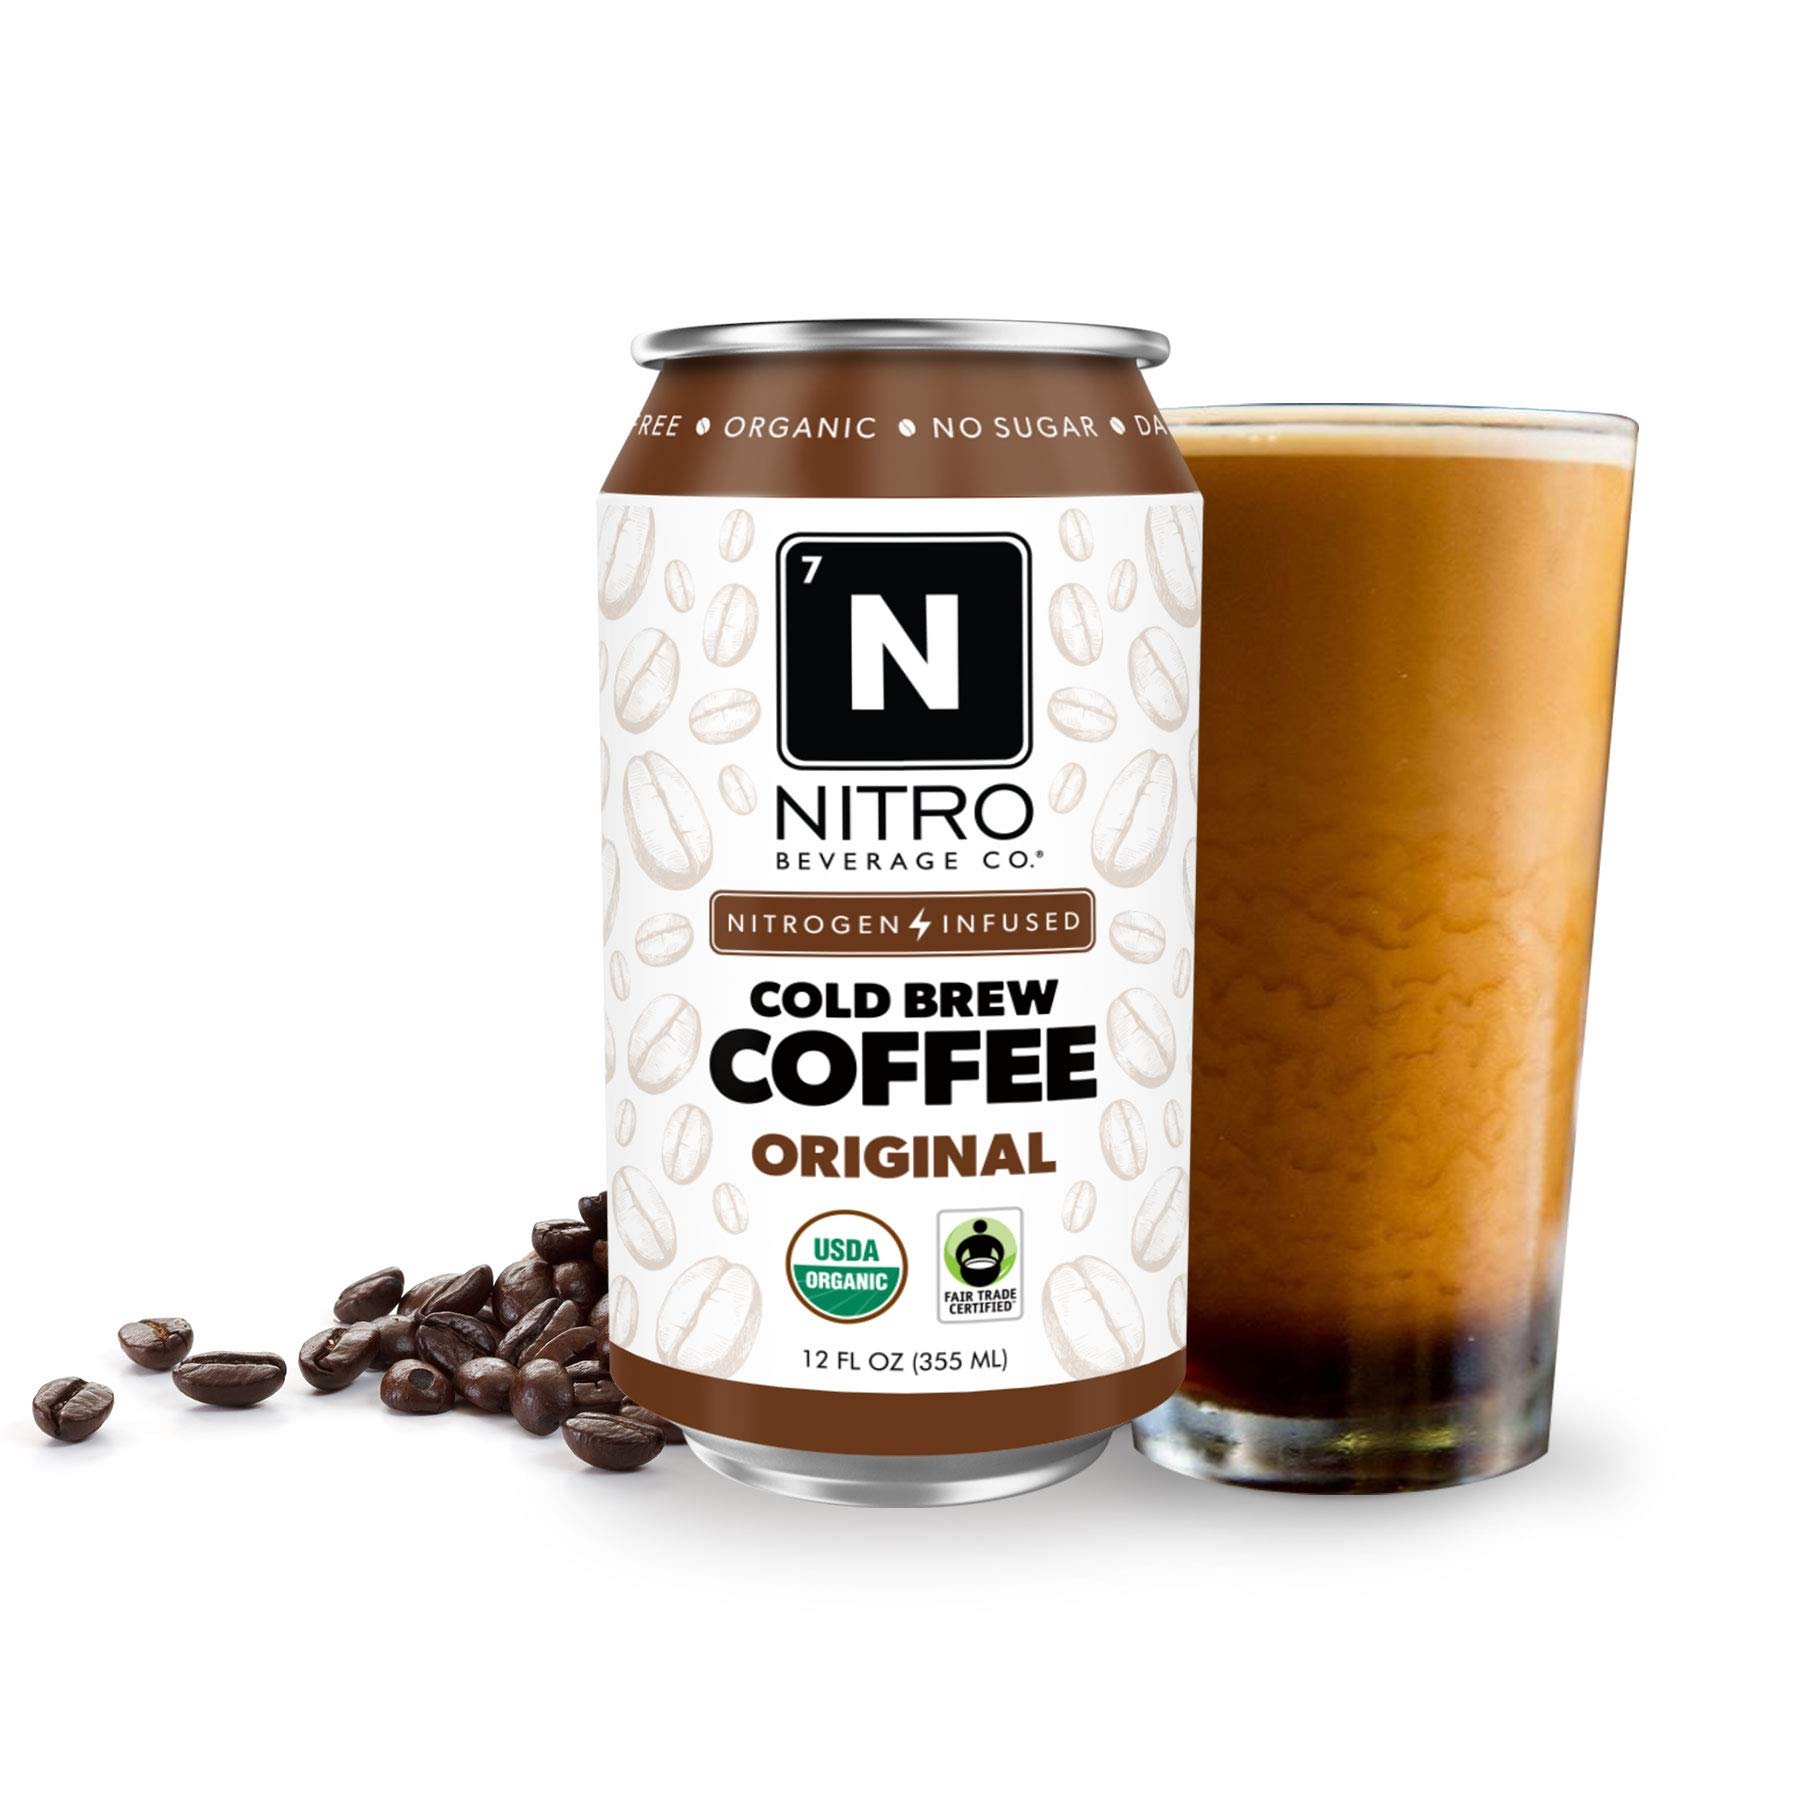 NITRO Beverage Co. | 12-Pack (12 fl oz) | Original NITRO Cold Brew Coffee | Certified Organic & Fair-Trade | Sugar Free, Dairy Free, Zero Calories | Always Cold, Always Fresh by NITRO Beverage Co.